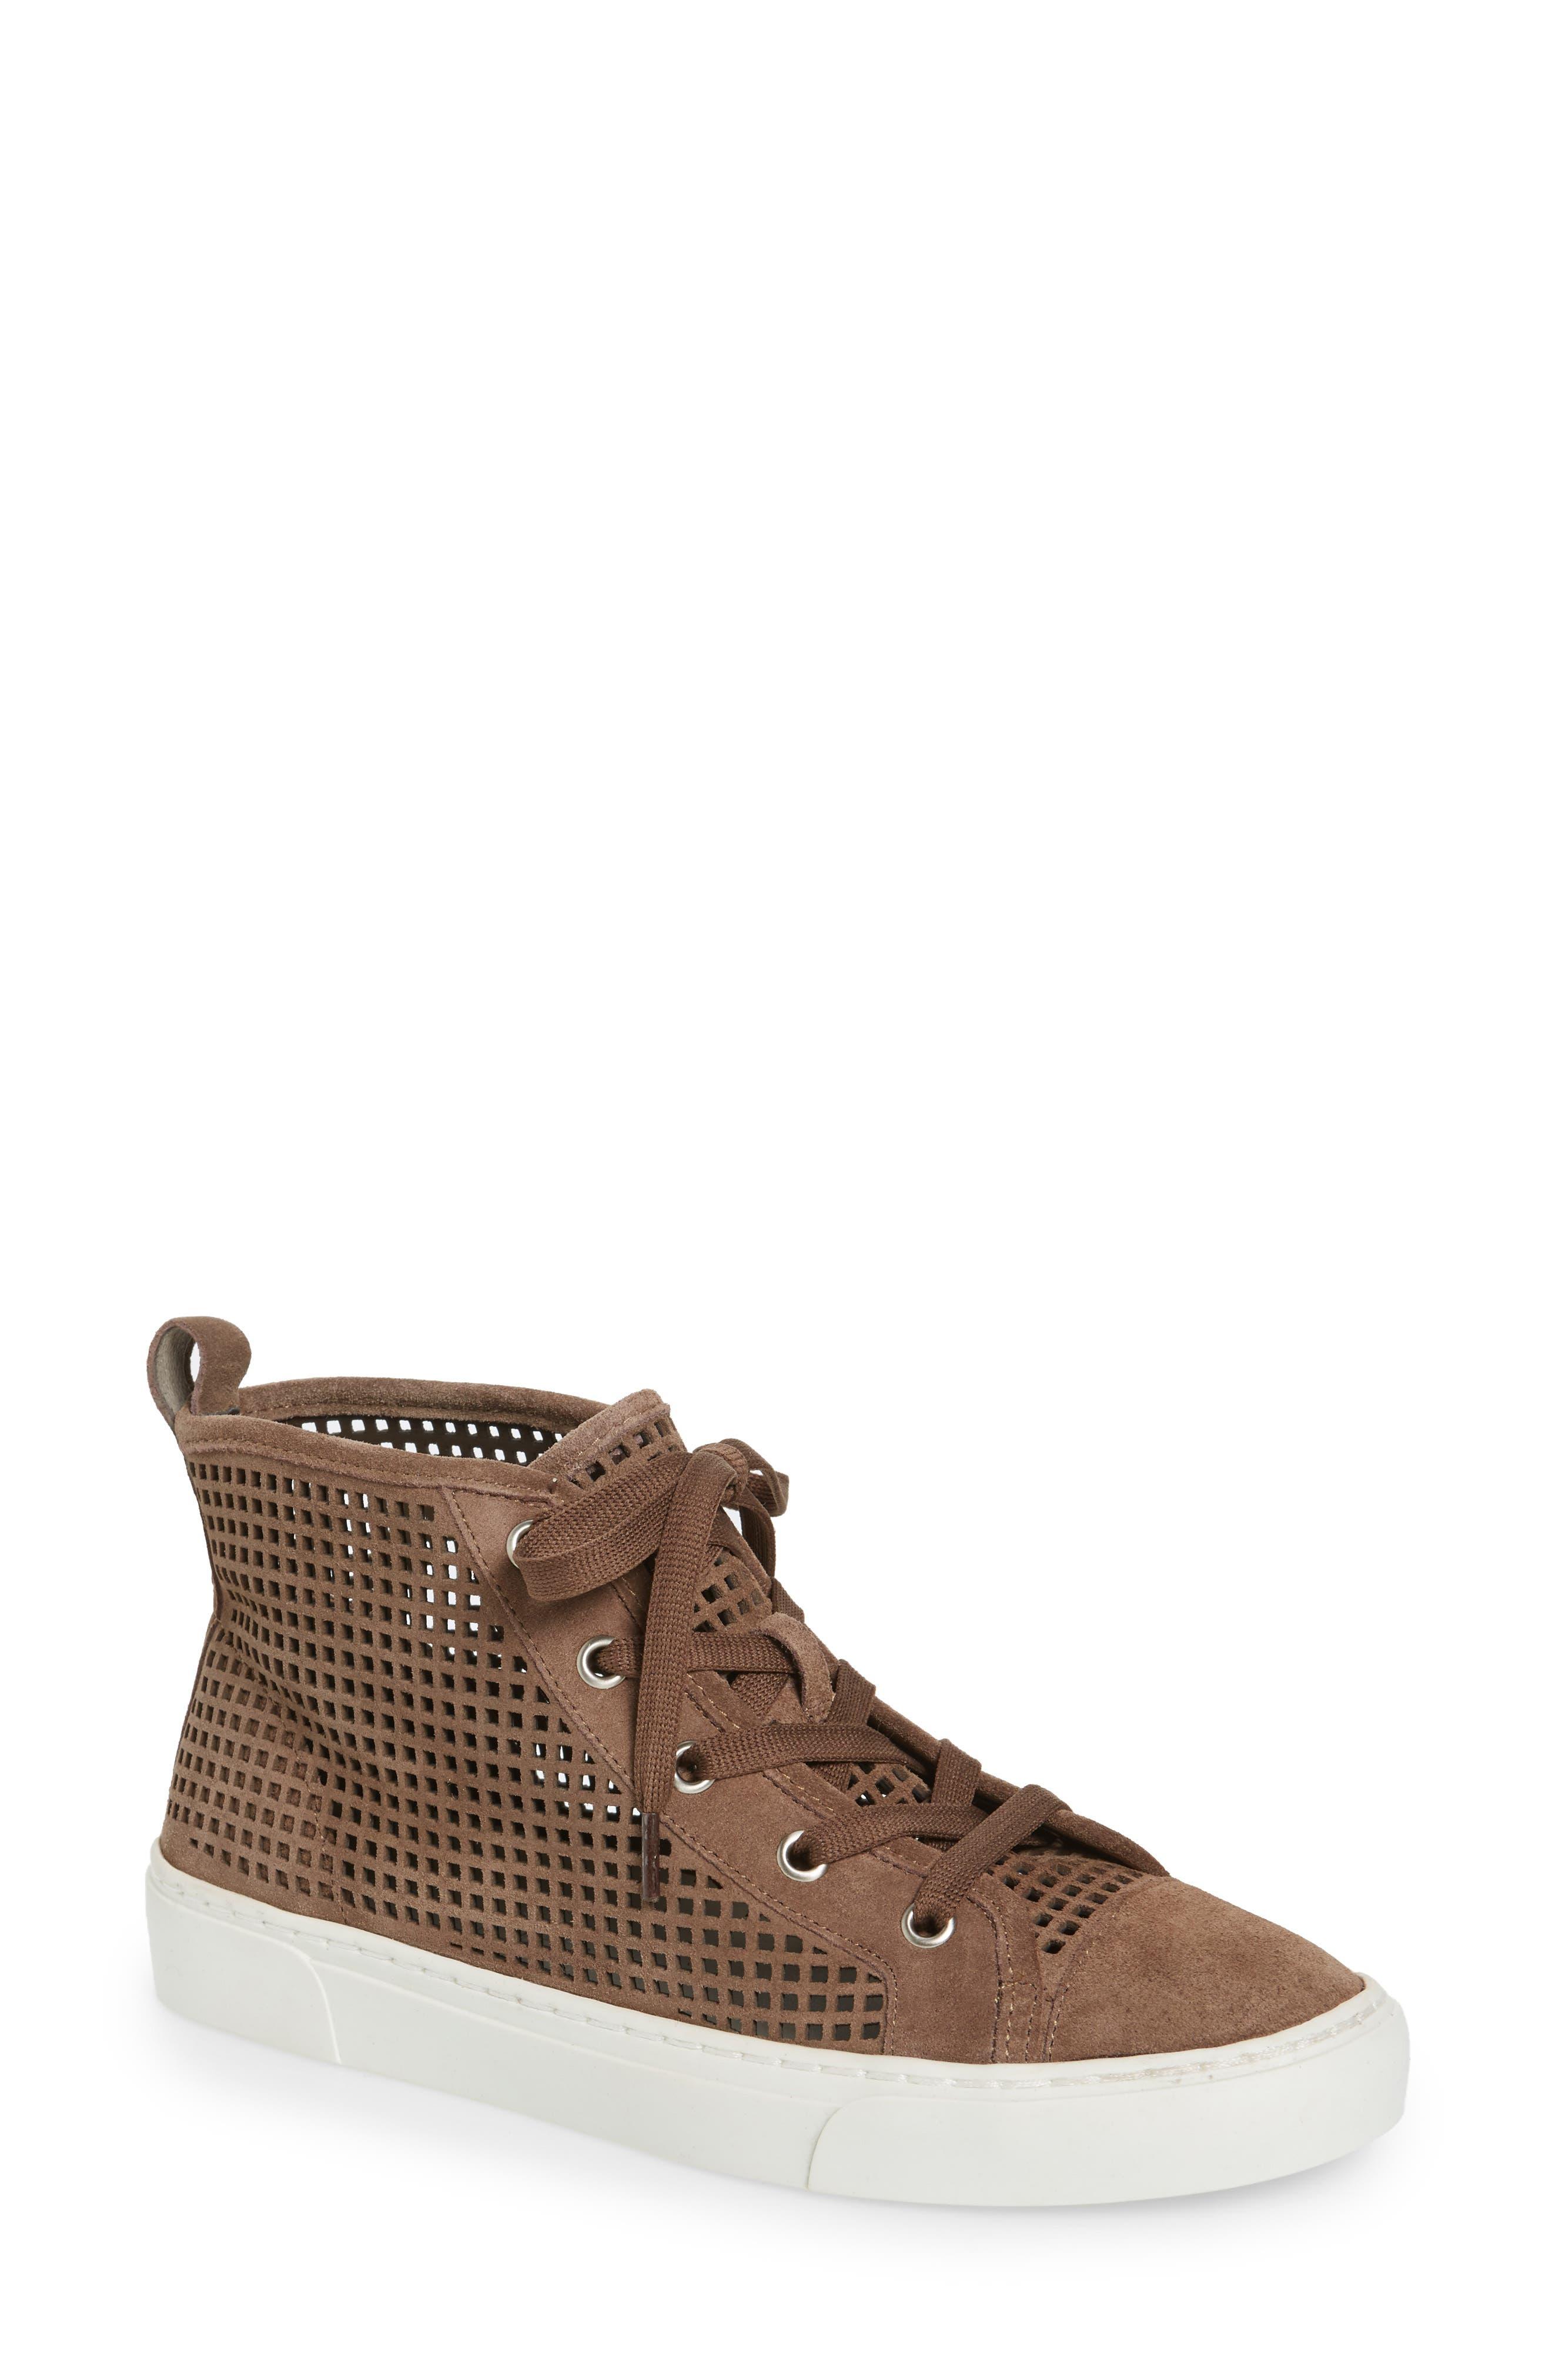 1.STATE Dulcia Perforated High-Top Sneaker